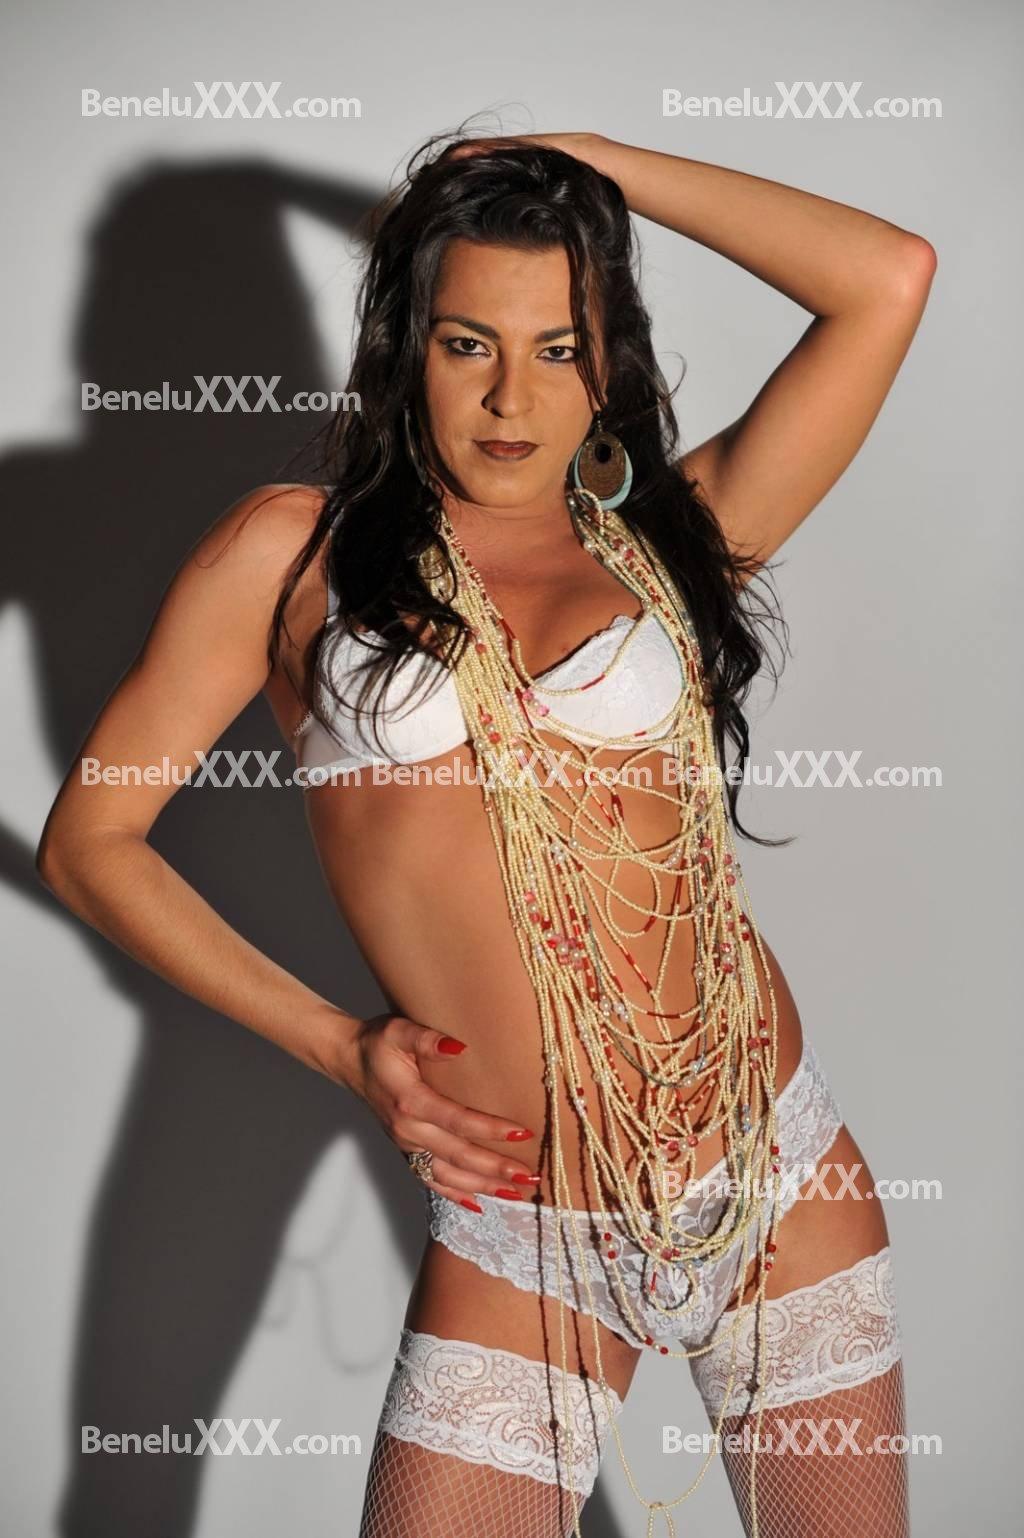 grosse mature francaise escort girl mantes